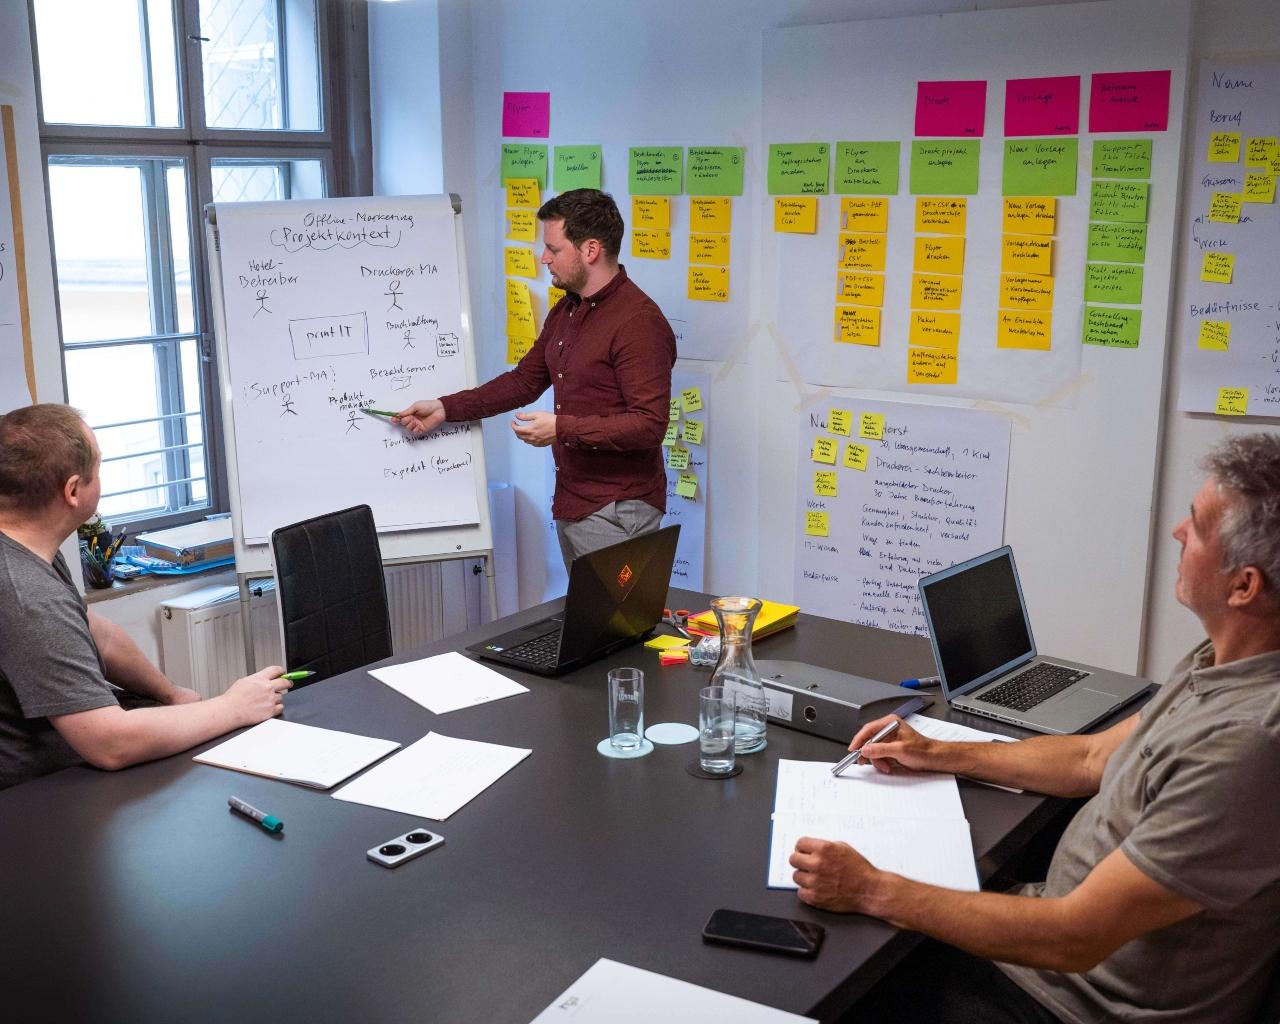 ITELL.SOLUTIONS | Partner of Bernd Kopper Gründer*inneninfo